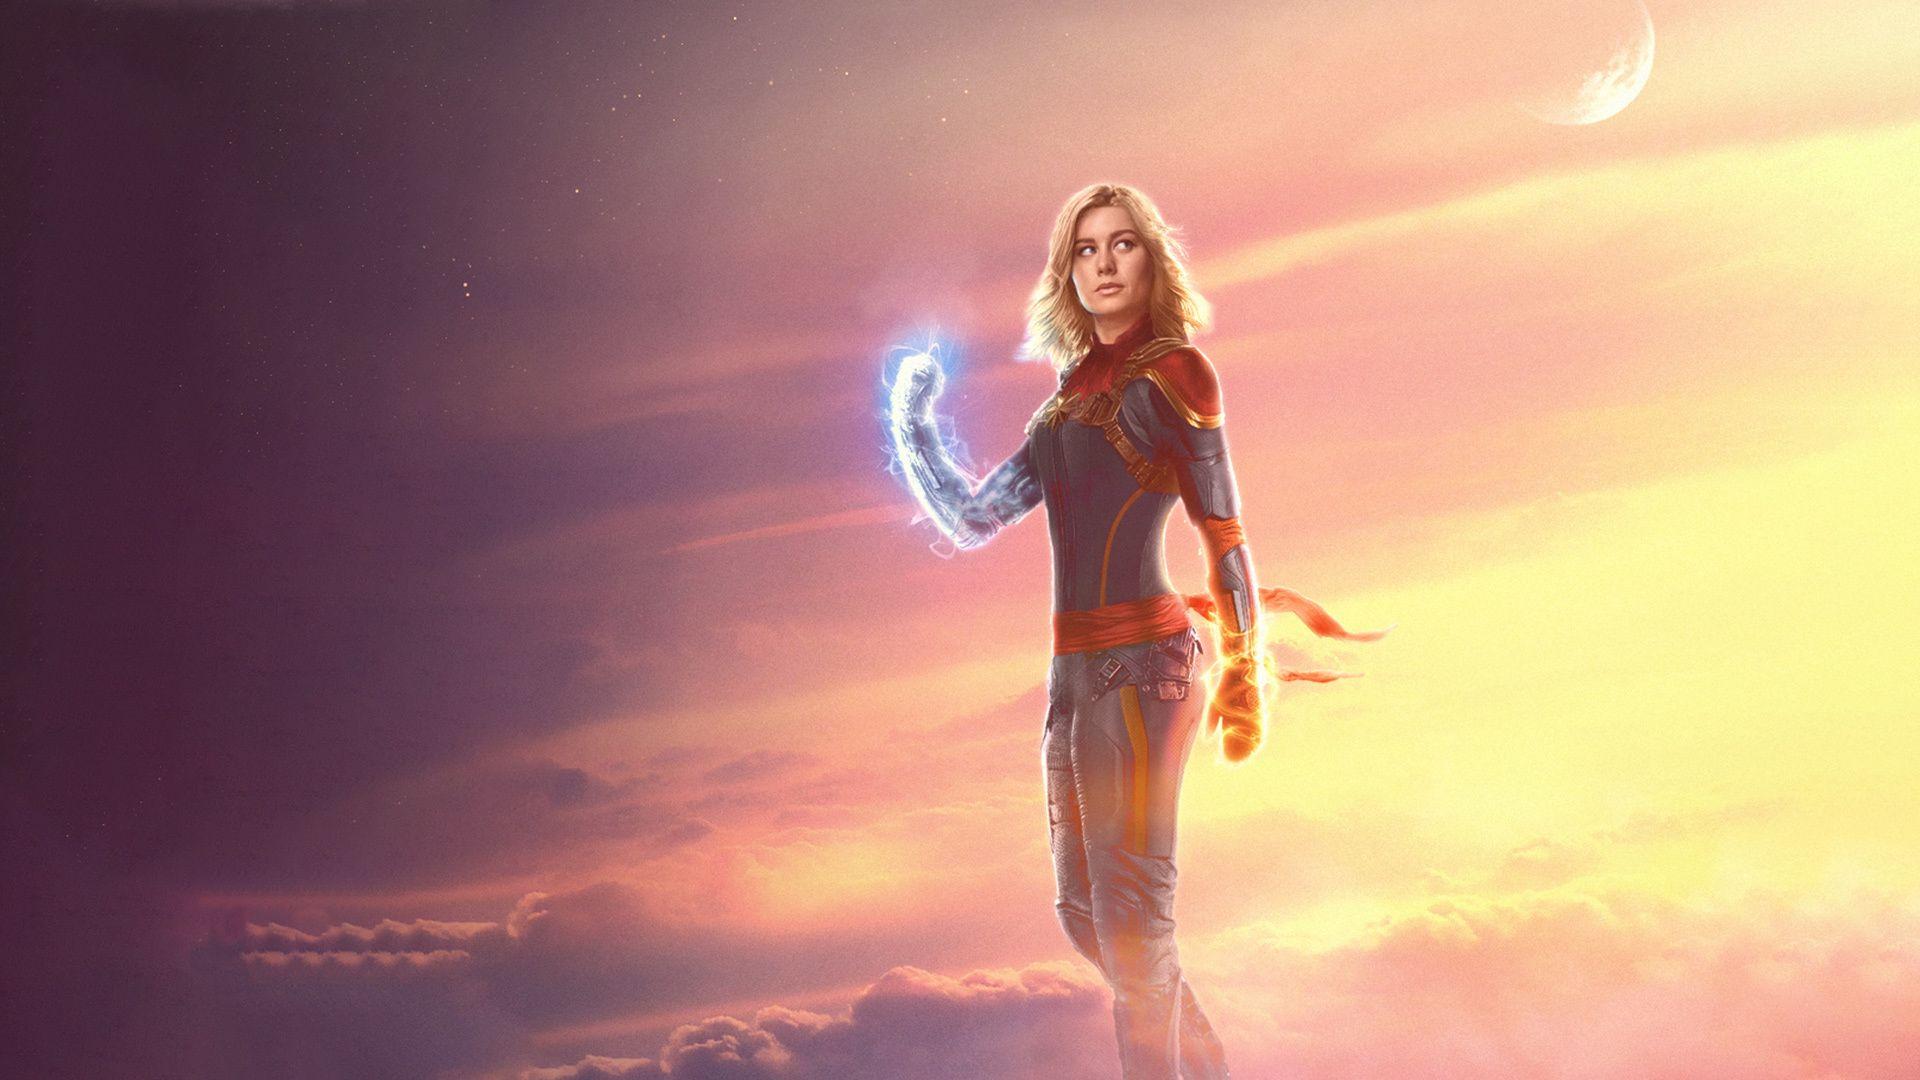 Captain Marvel Background Wallpaper HD